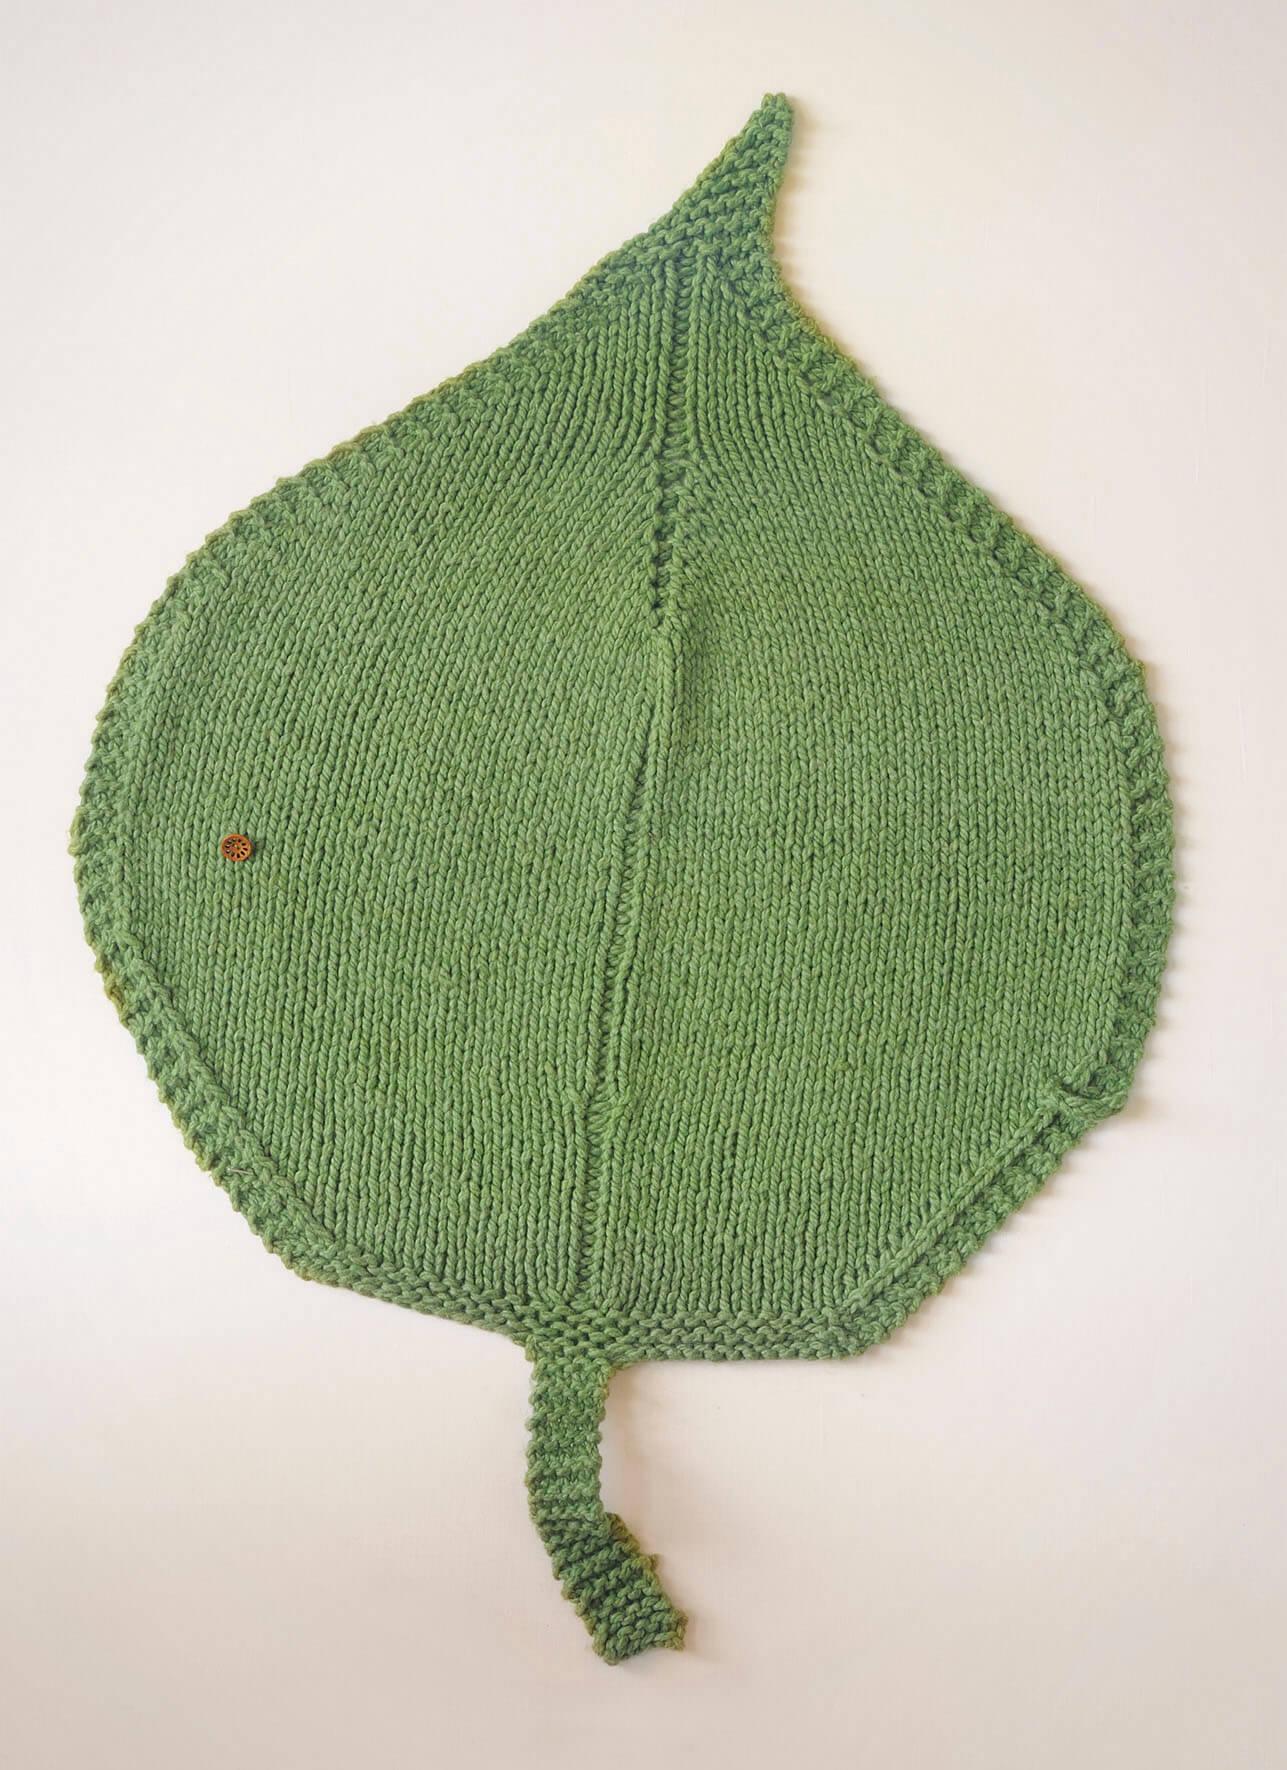 c075a70c55d9 Leaf Blanket - Blue Sky Fibers